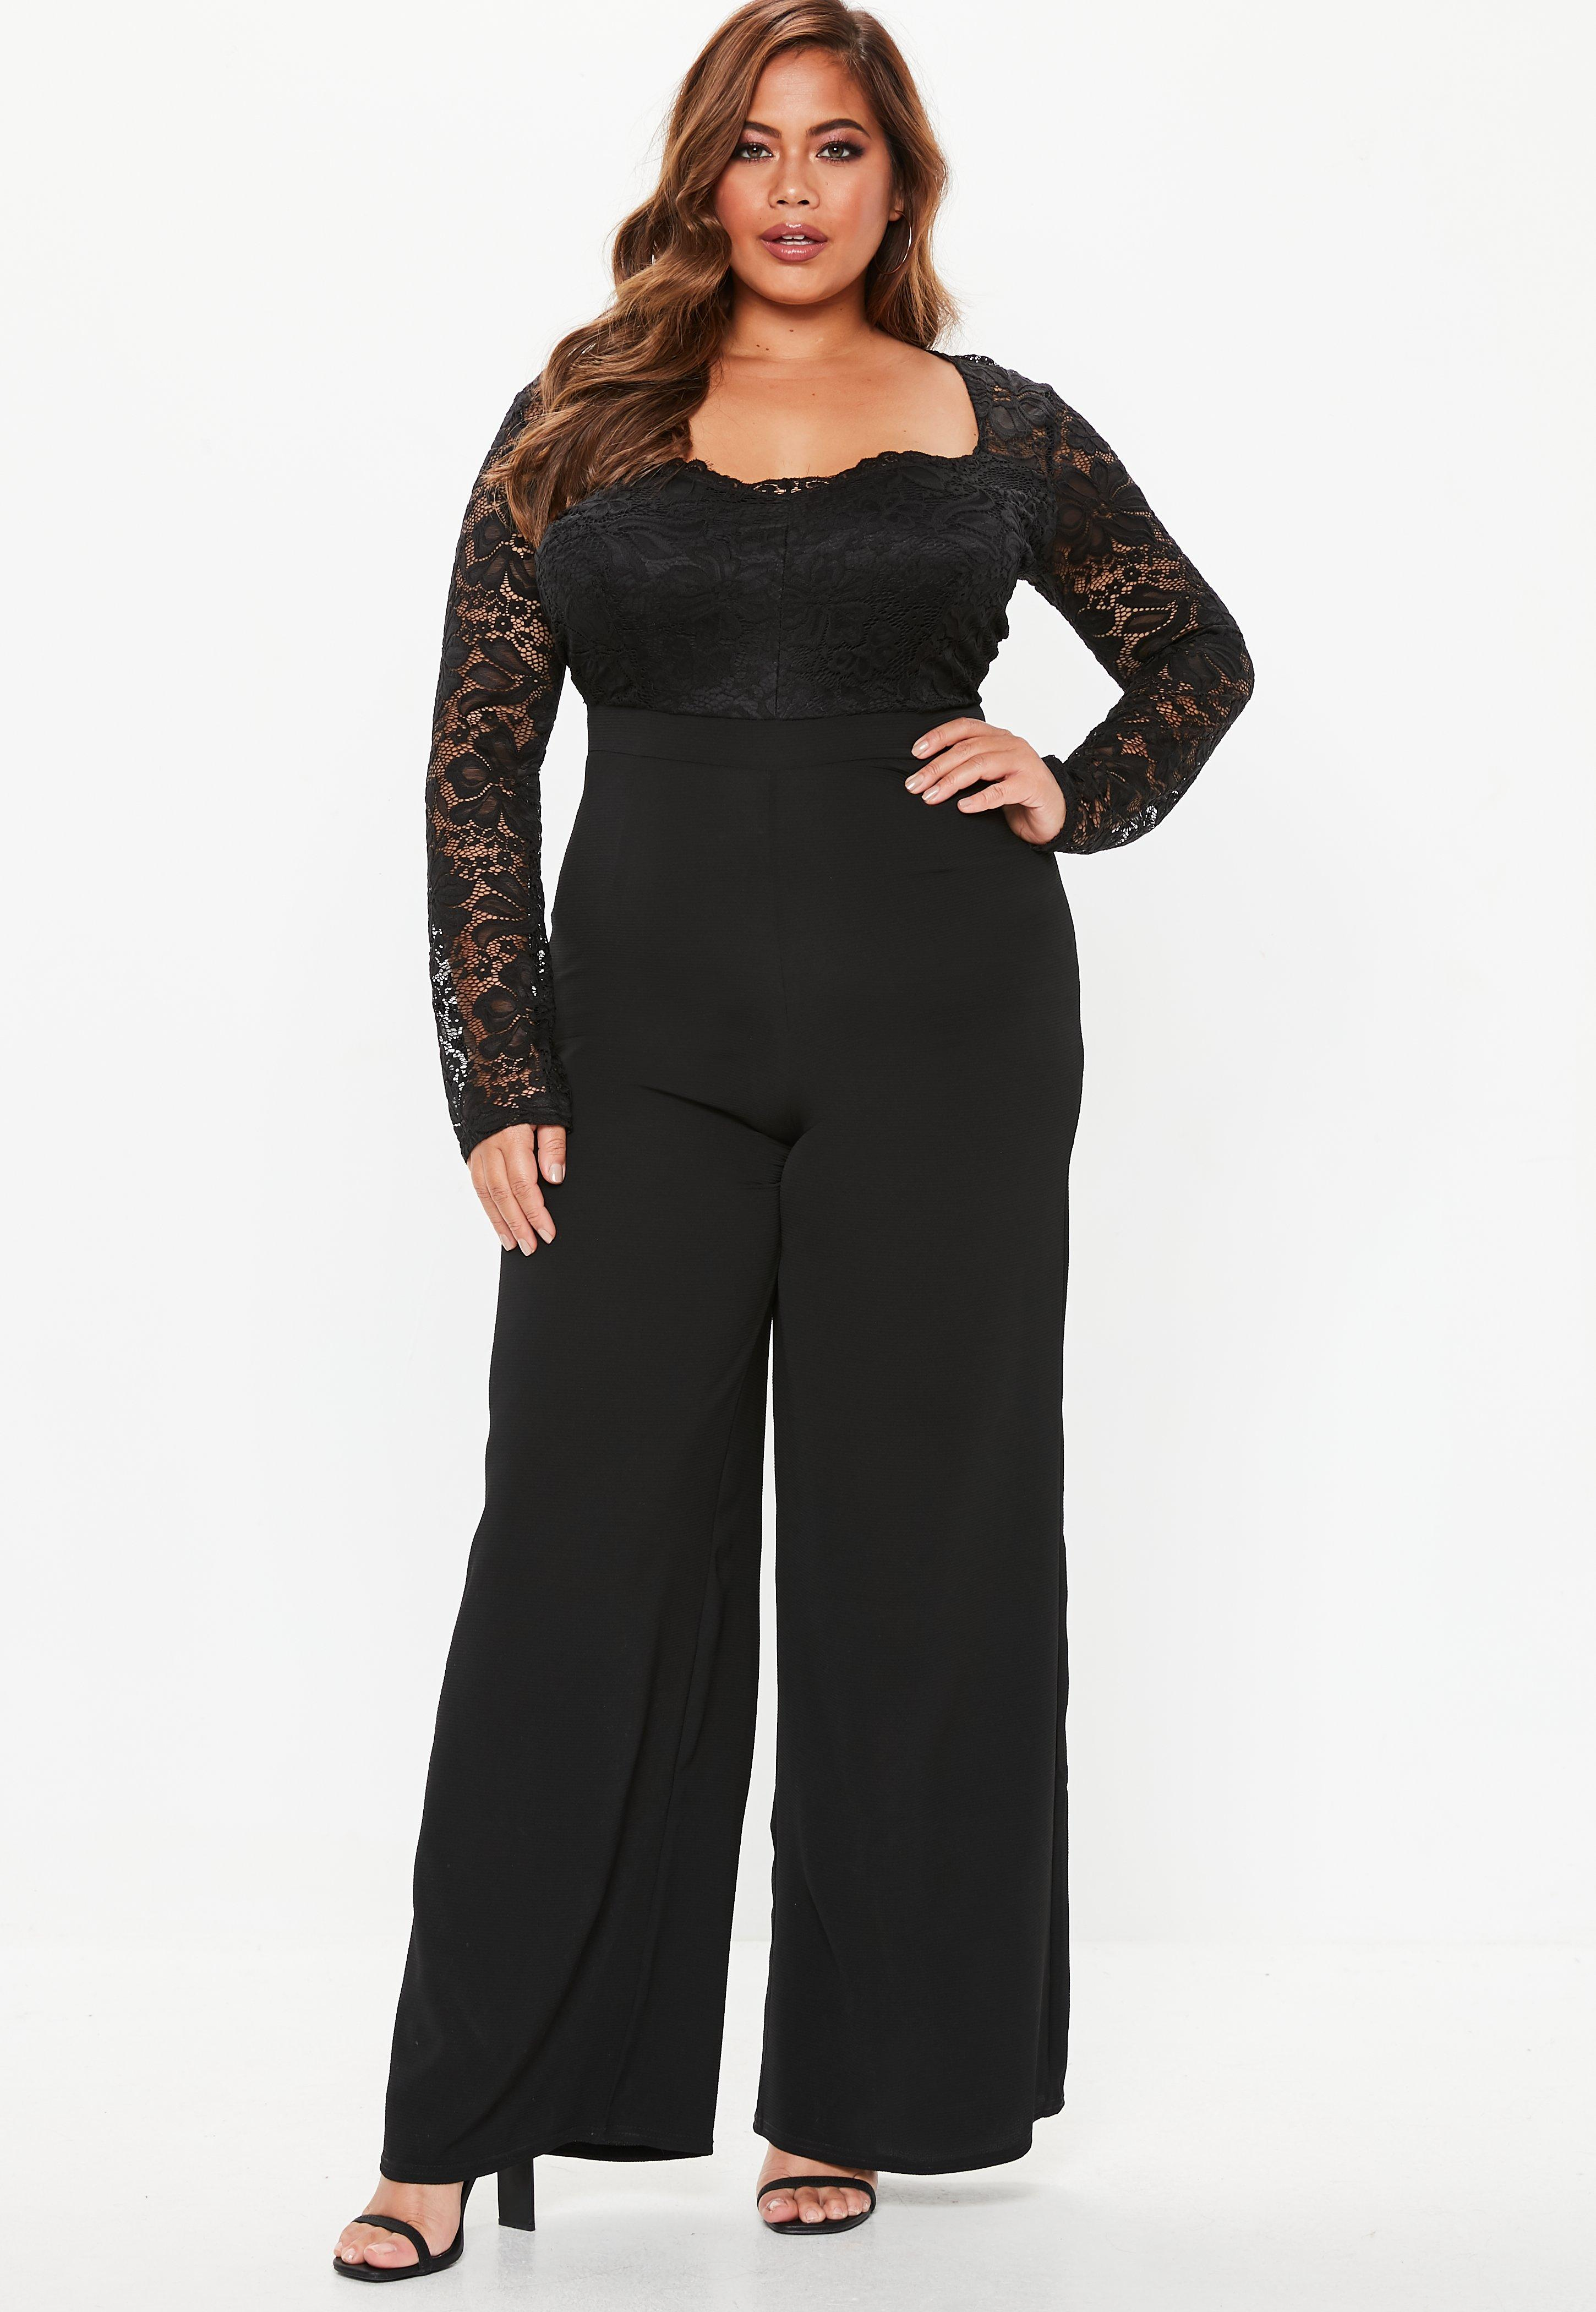 De Tallas Ropa Grandes Missguided En Mujer Moda q887xwd